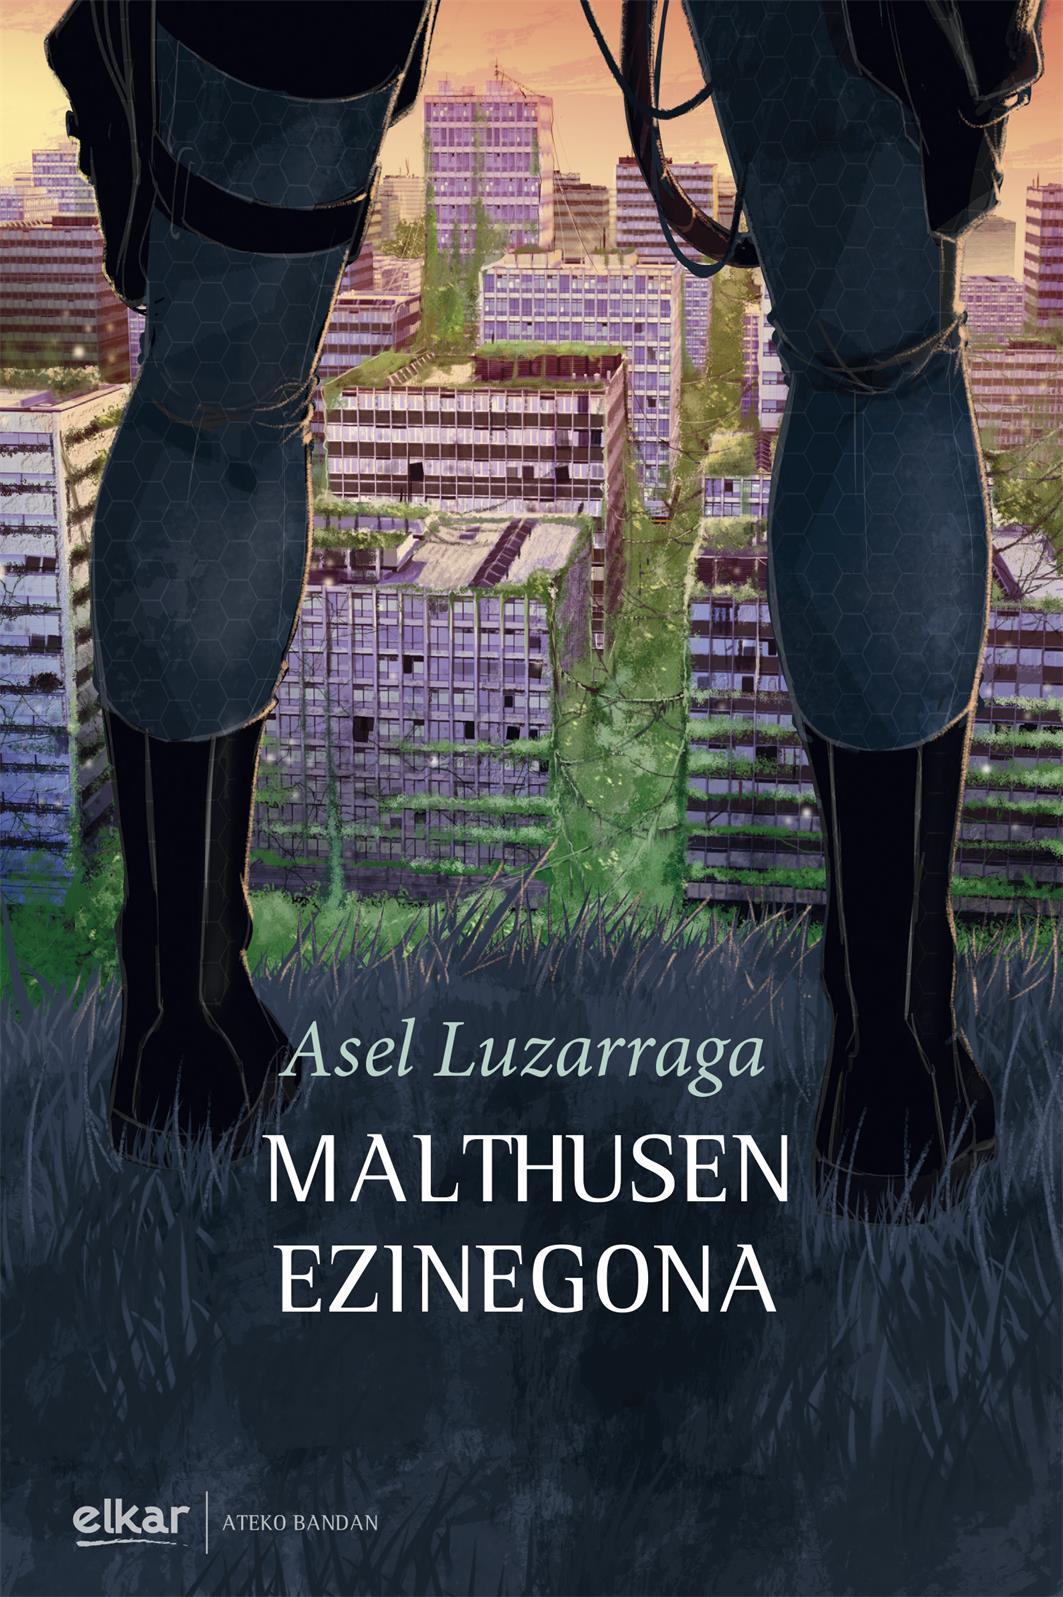 Malthusen ezinegona (El malestar de Malthus)